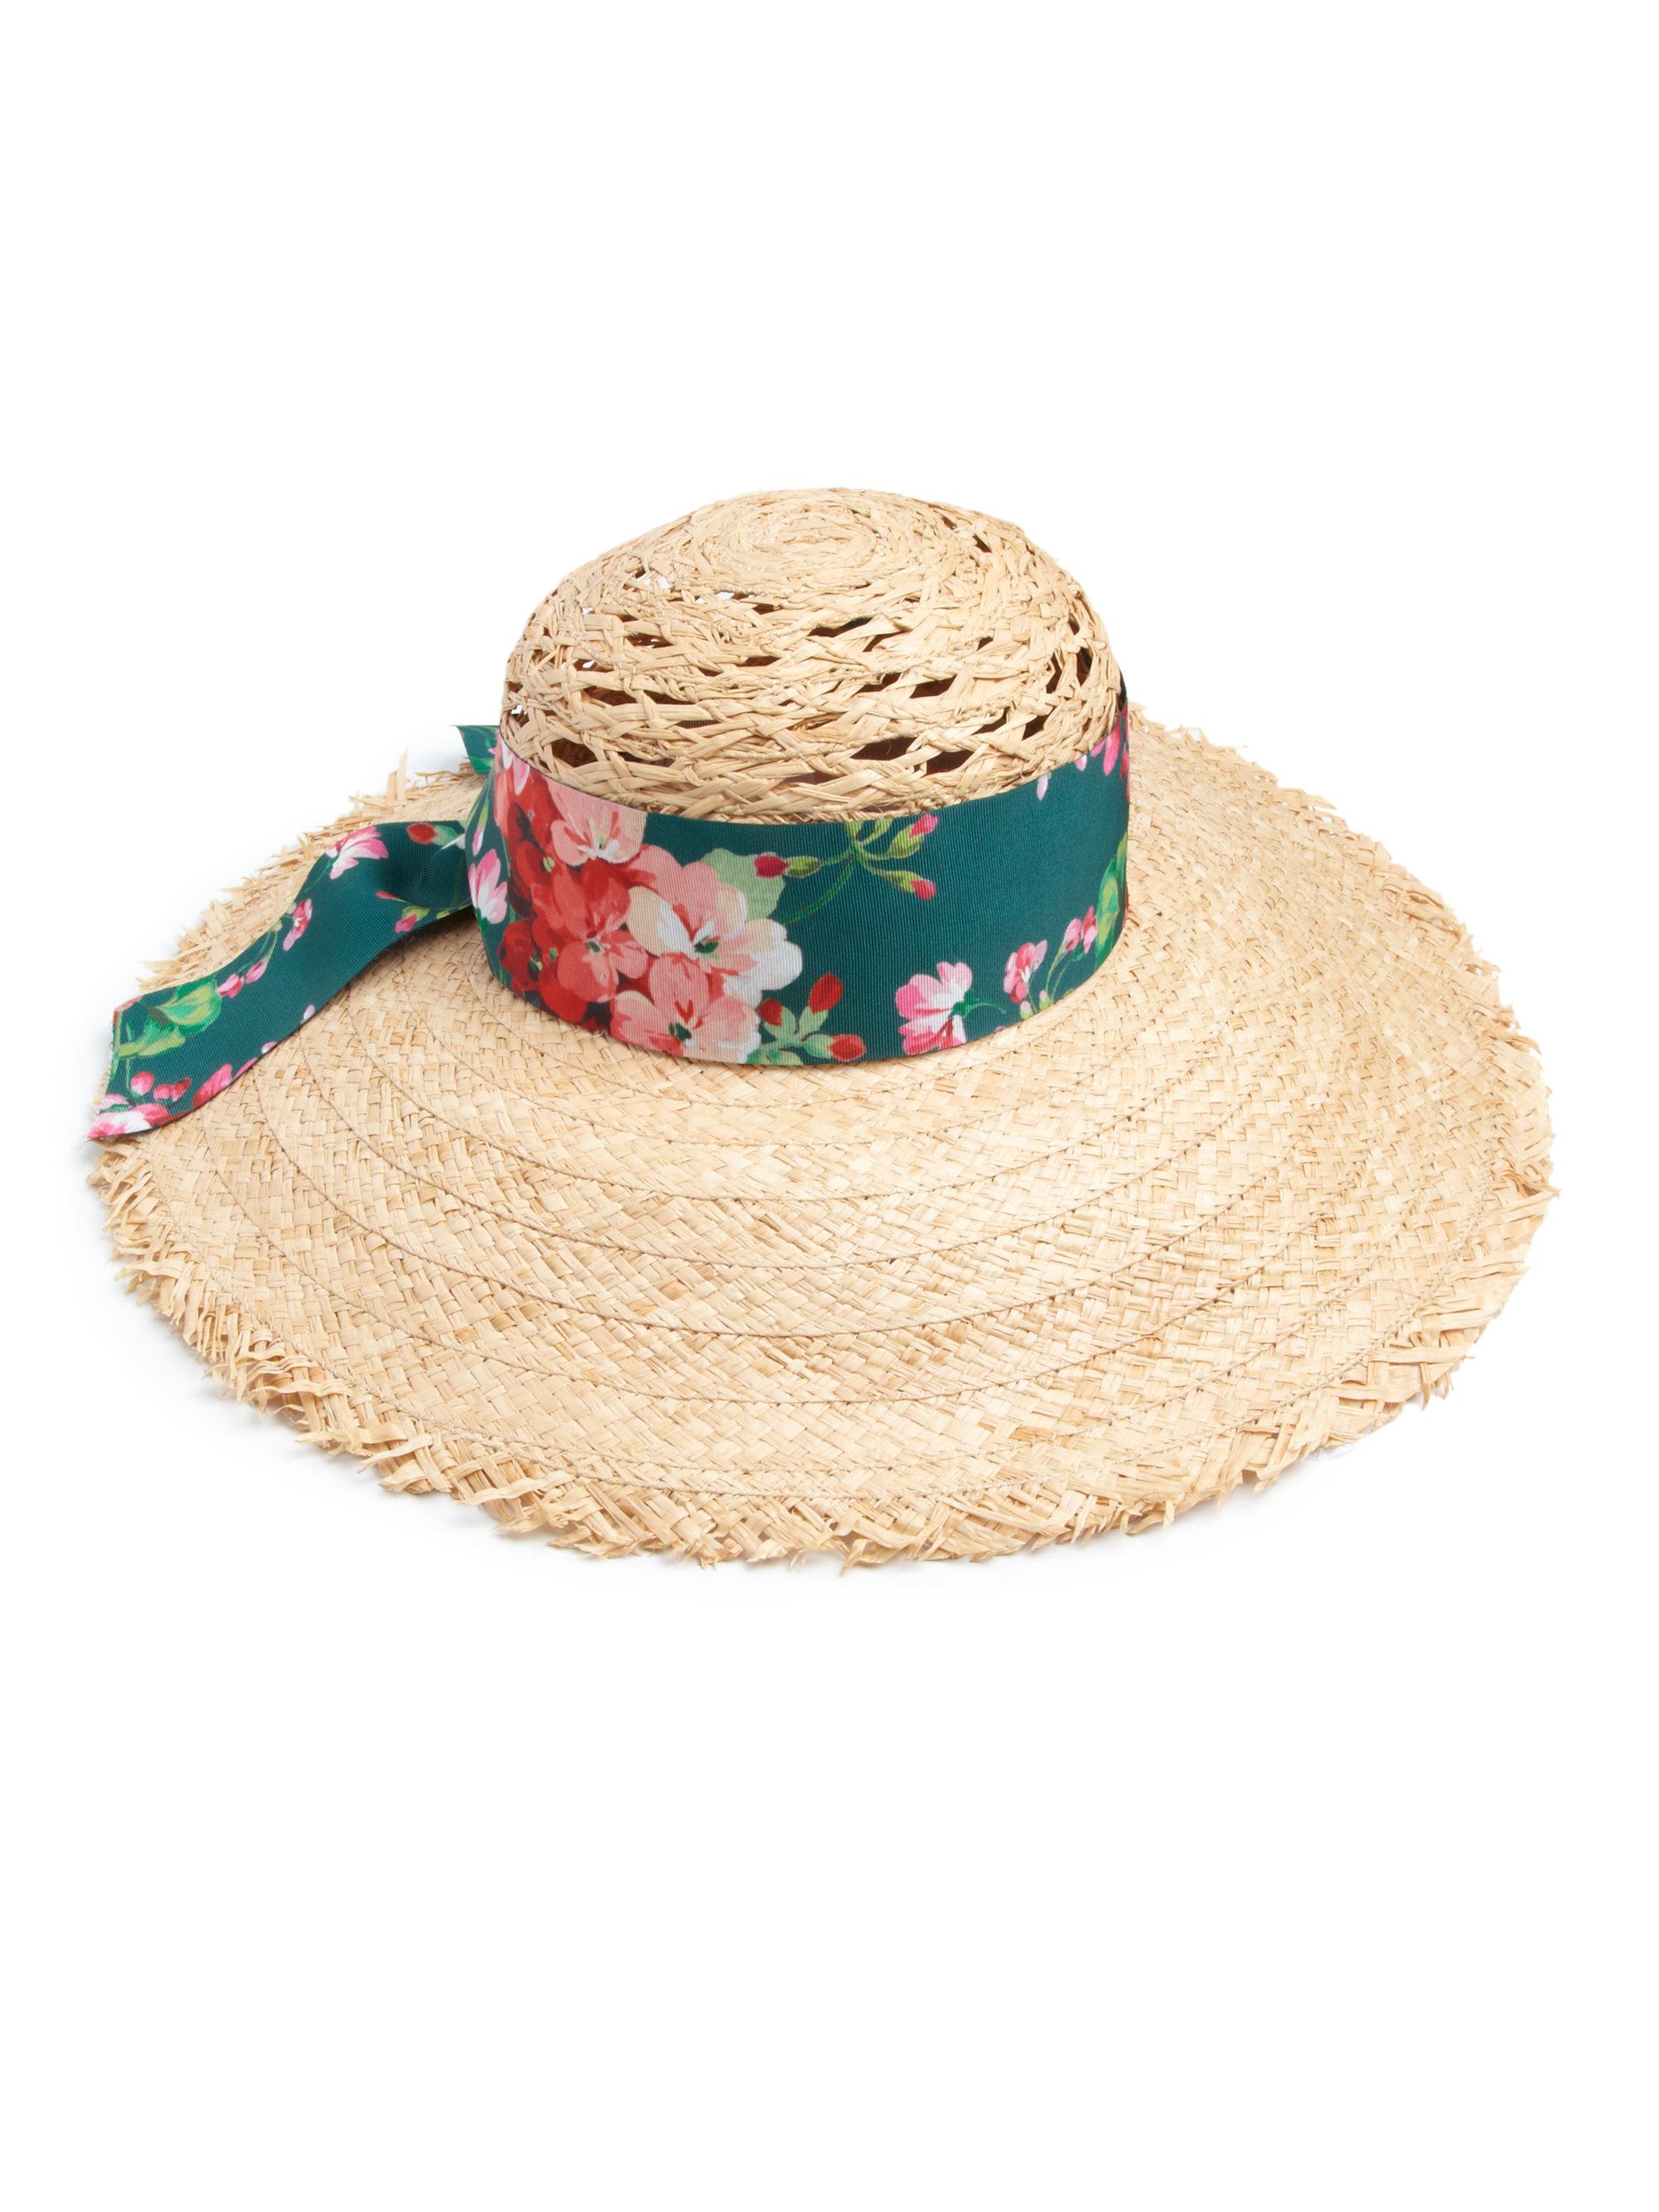 Lyst - Gucci Straw Sun Hat in Green 97619a06f6b